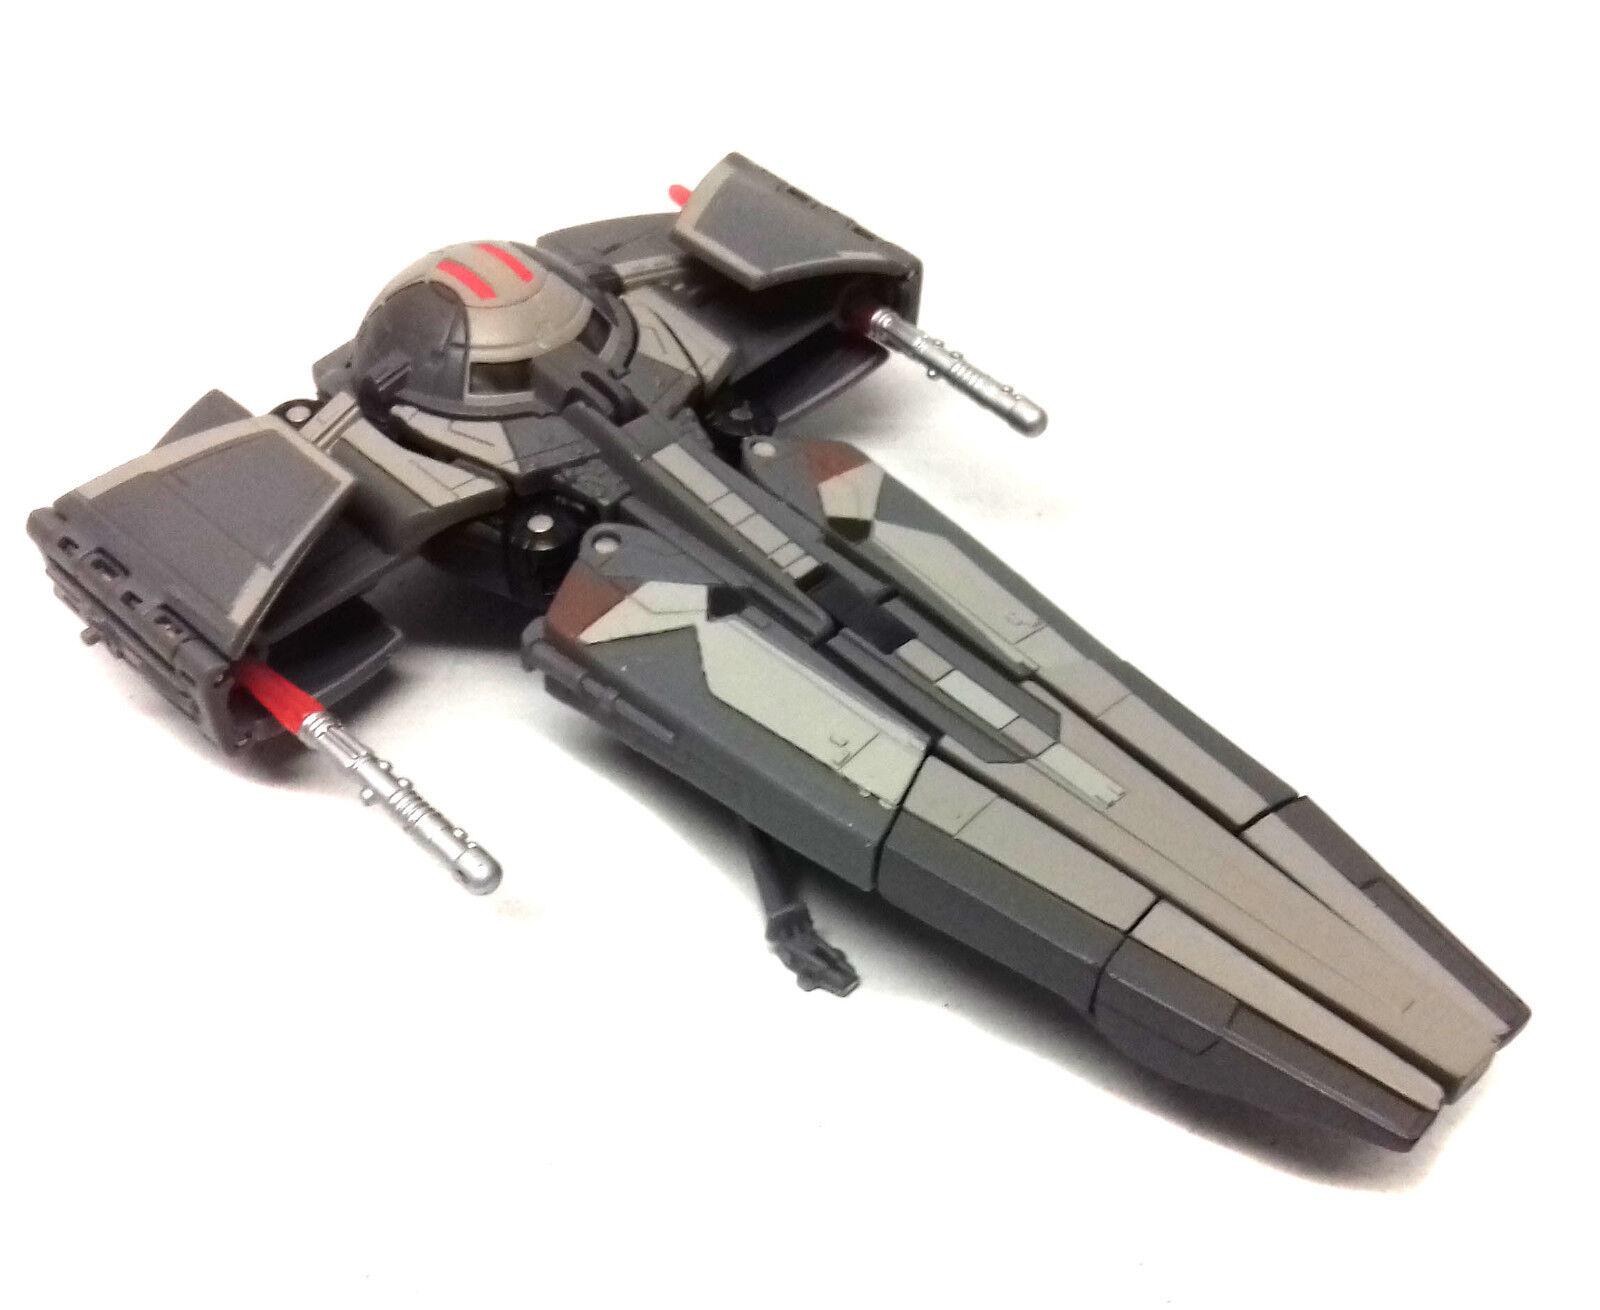 STAR WARS TRANSFORMERS Darth Maul Infiltrator 6    figure toy vehicle 100% RARE  4d3ffe